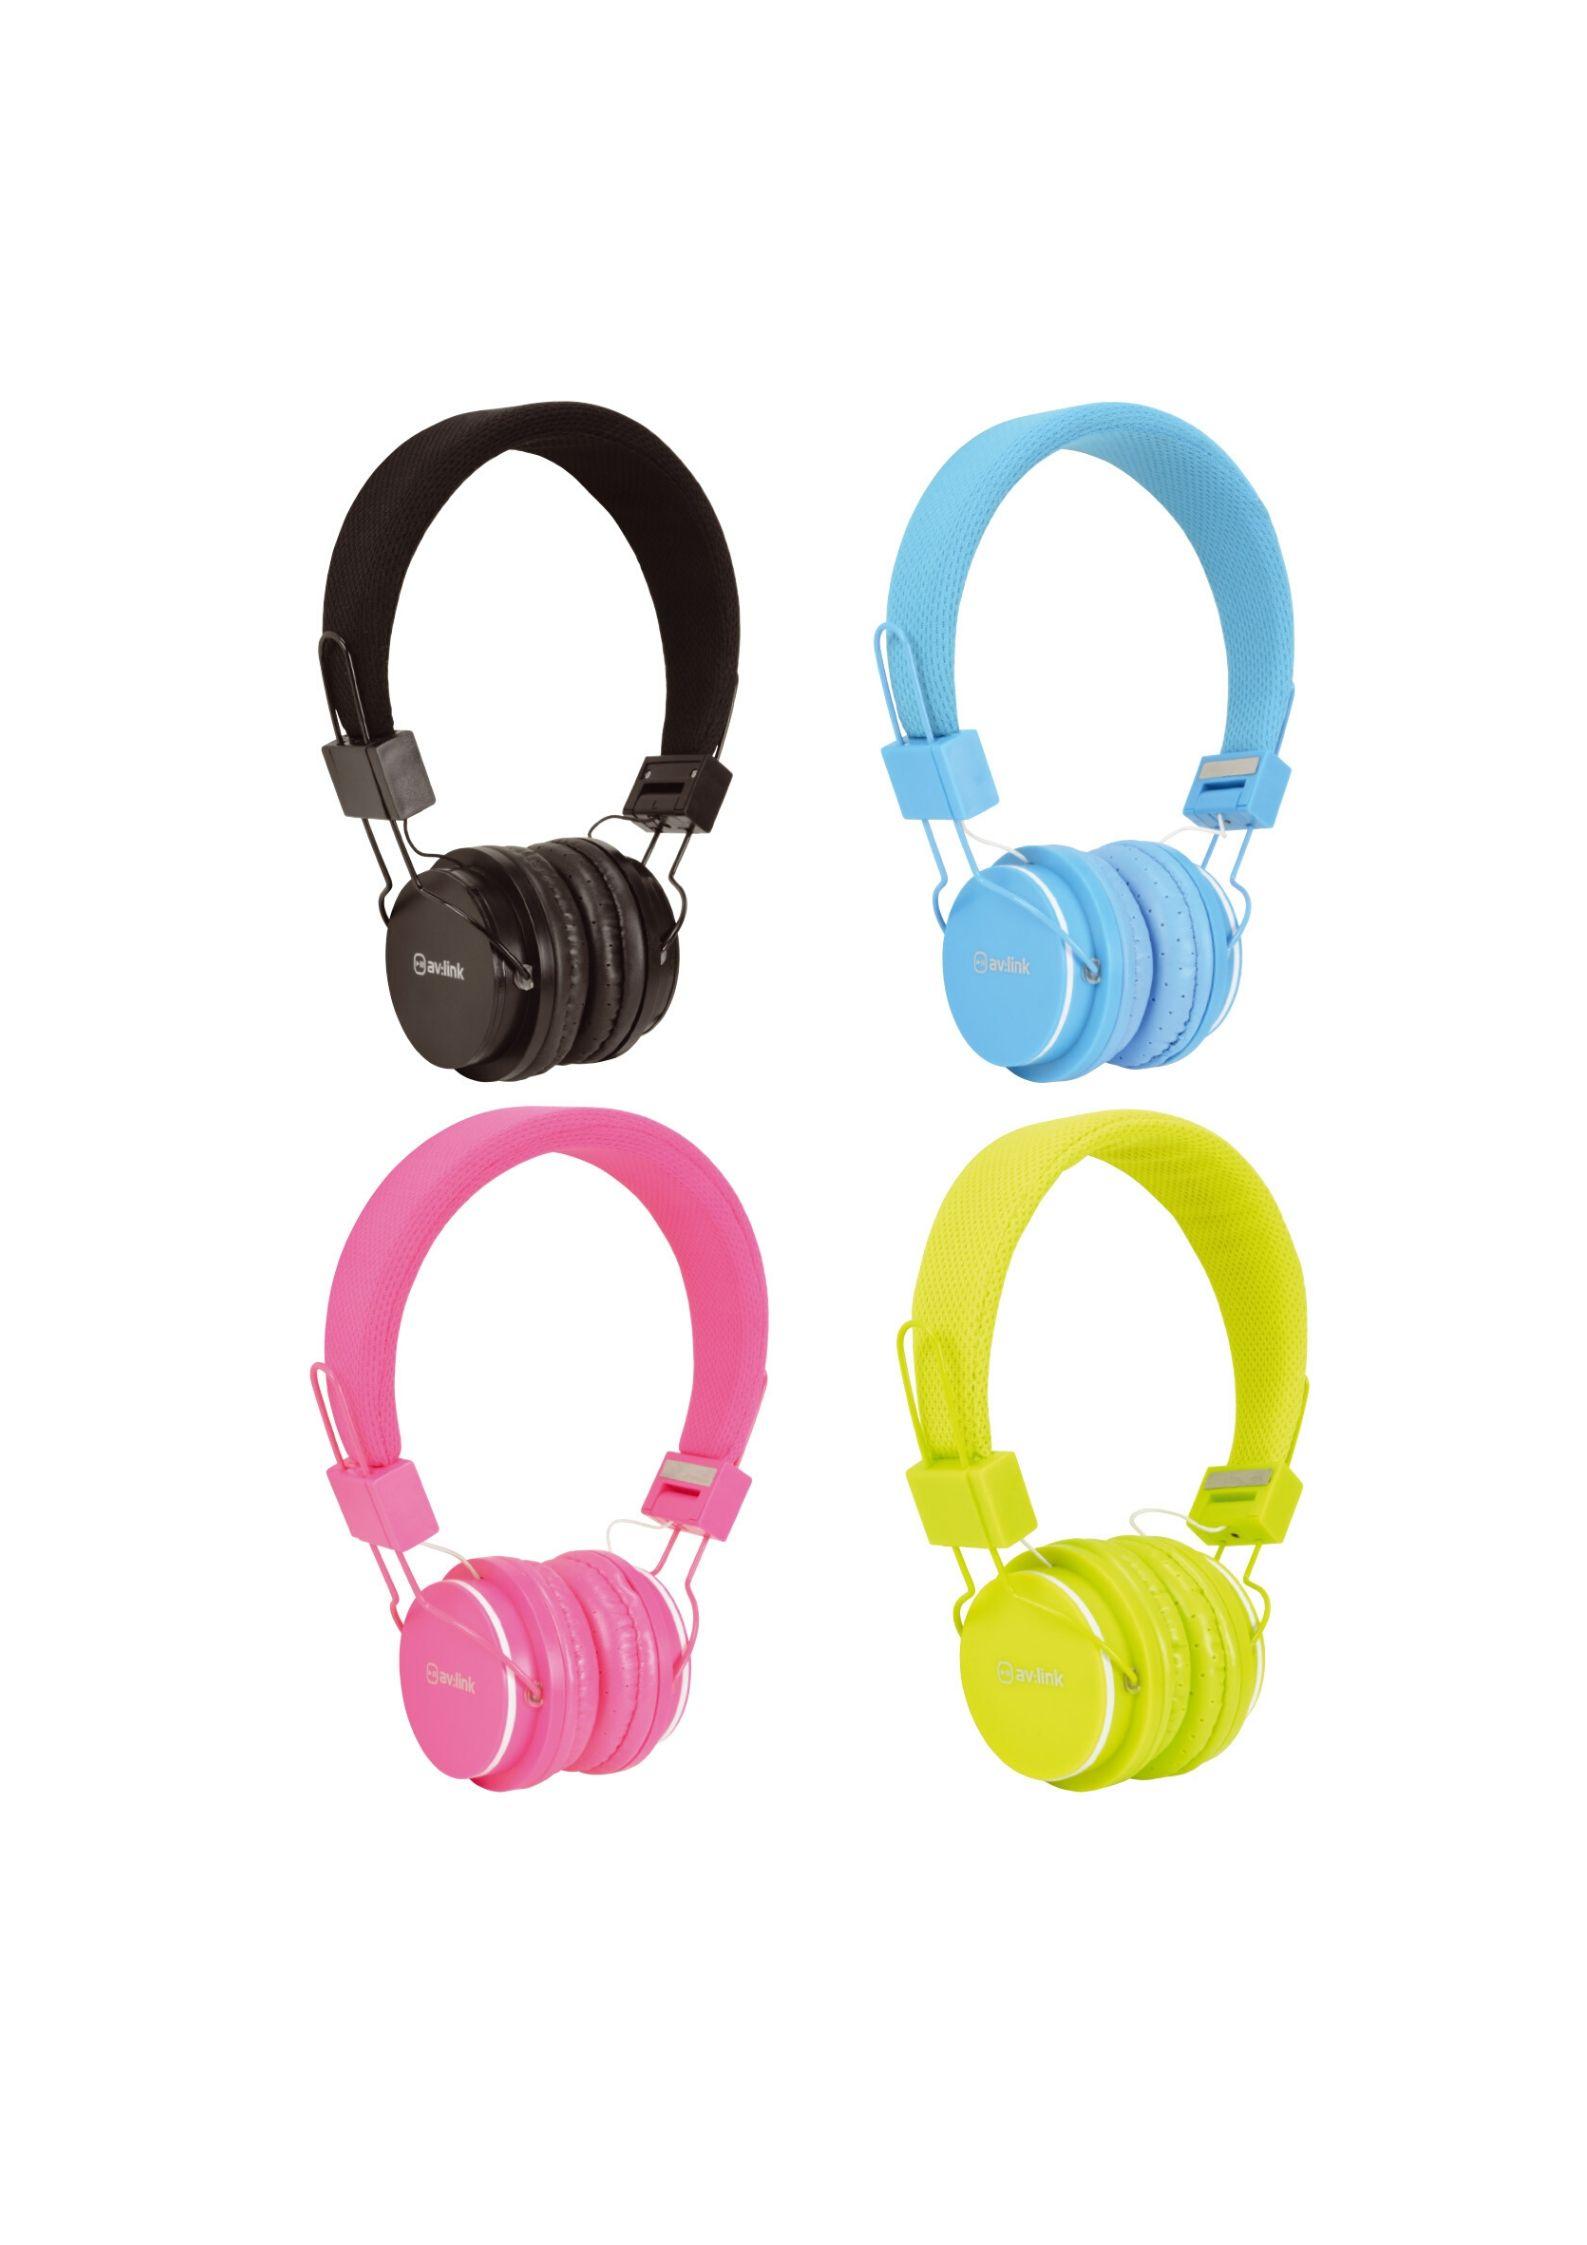 AvLink CH850 Παιδικά Ακουστικά Με Ενσωματωμένο Μικρόφωνο